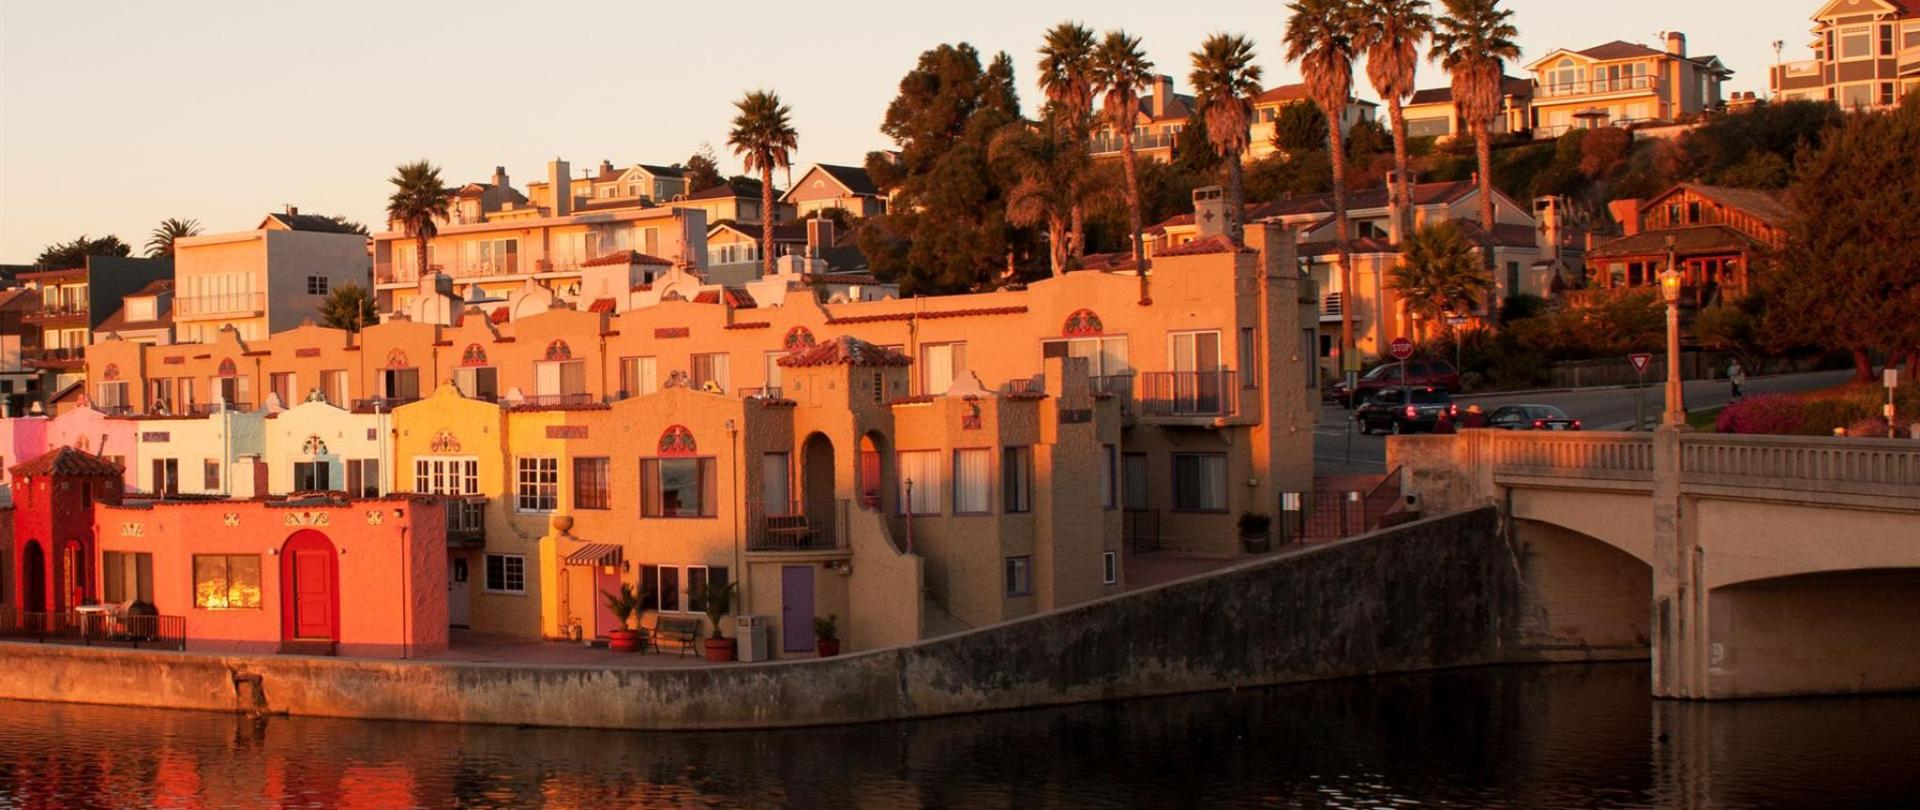 Capitola Venetian Hotel